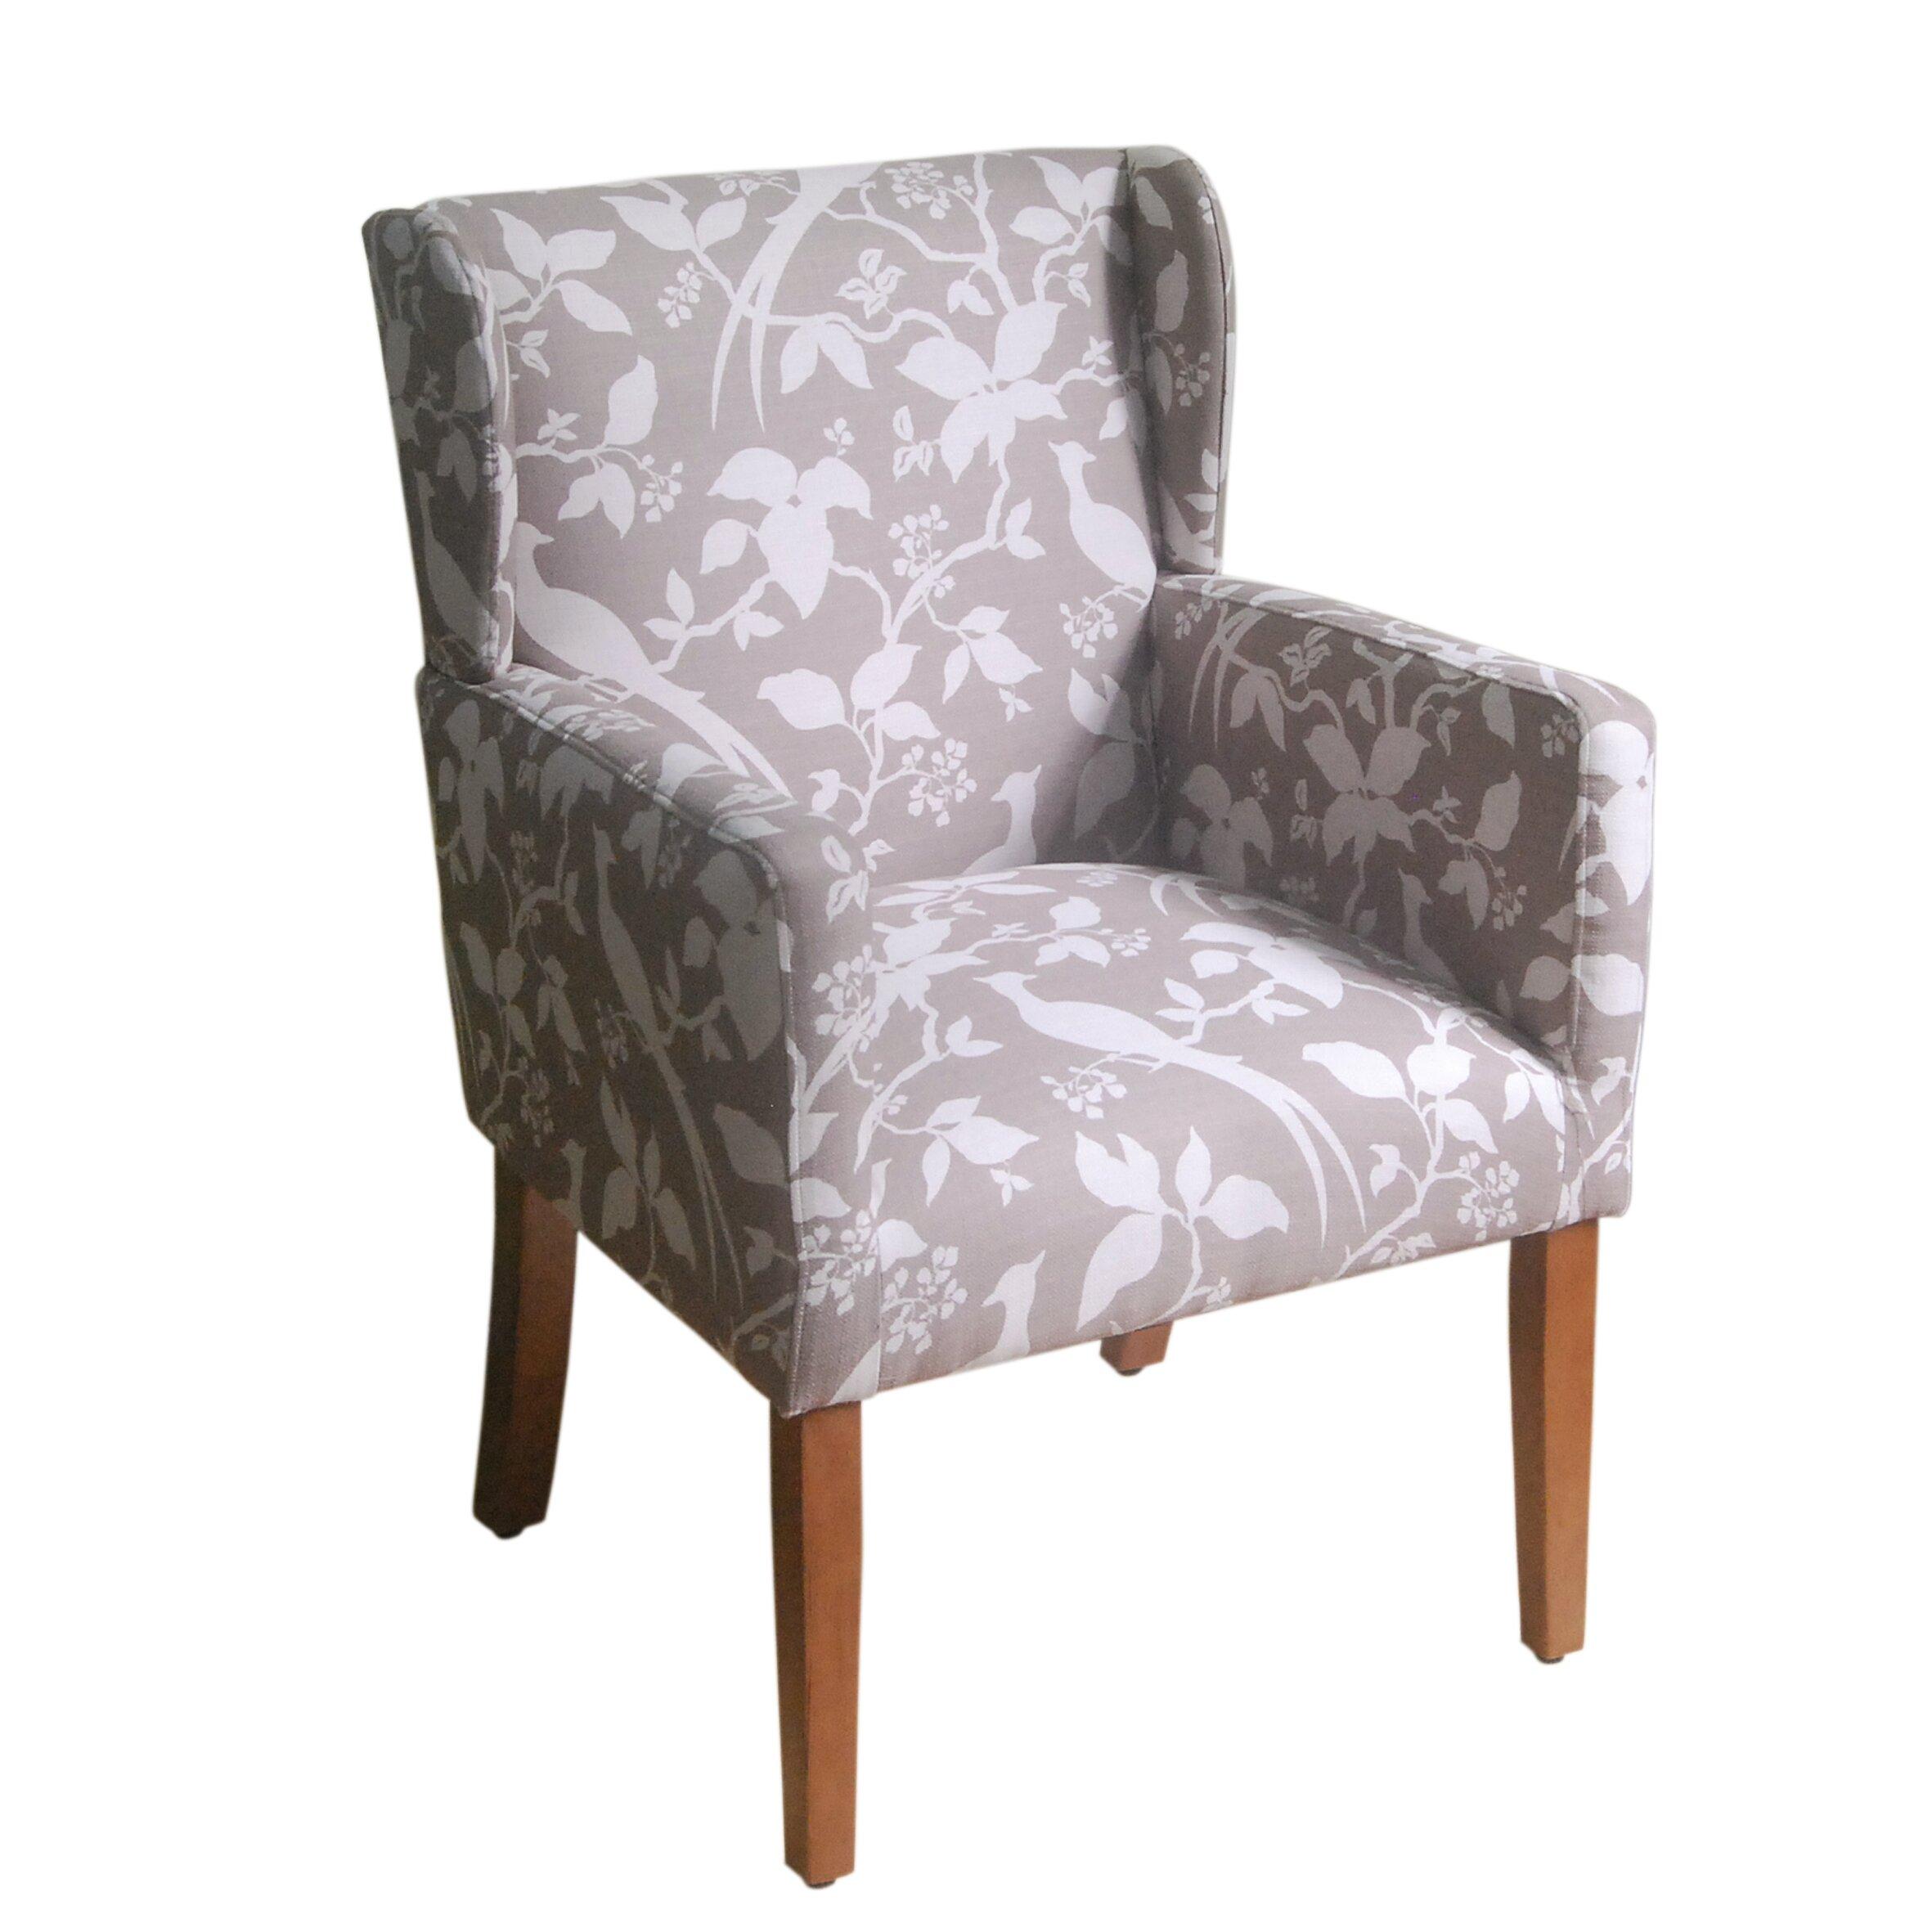 Morgan slipper chair with arms k6856 f1598 jpg